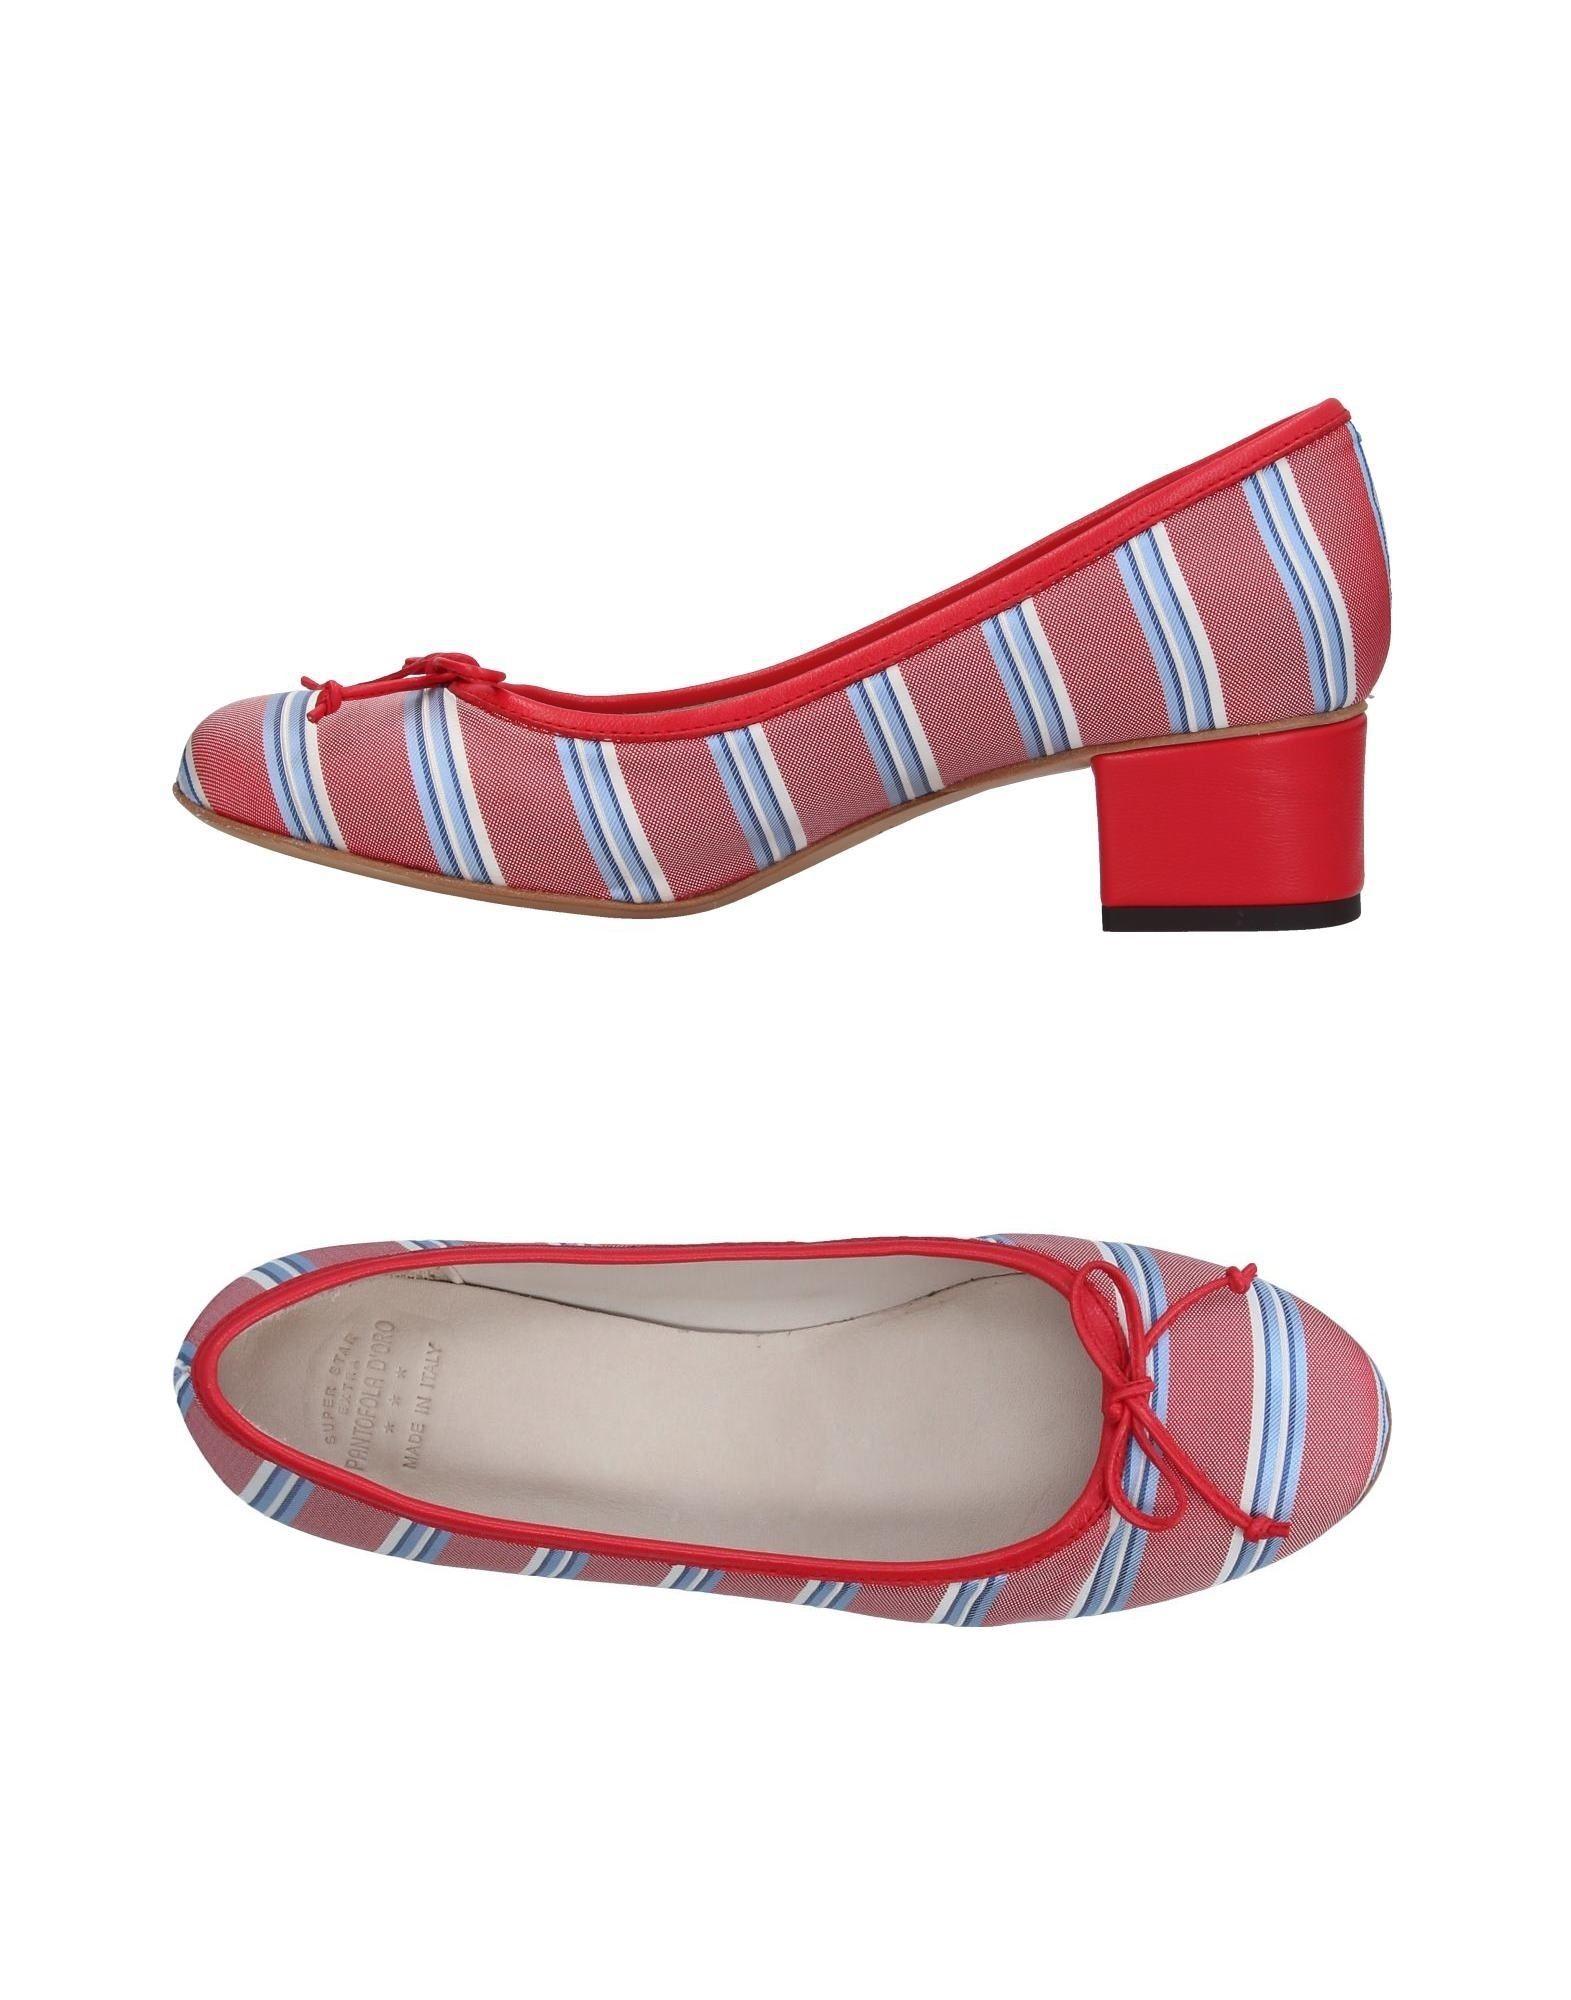 Pantofola D'oro Pumps Damen  11366138IL Gute Qualität beliebte Schuhe